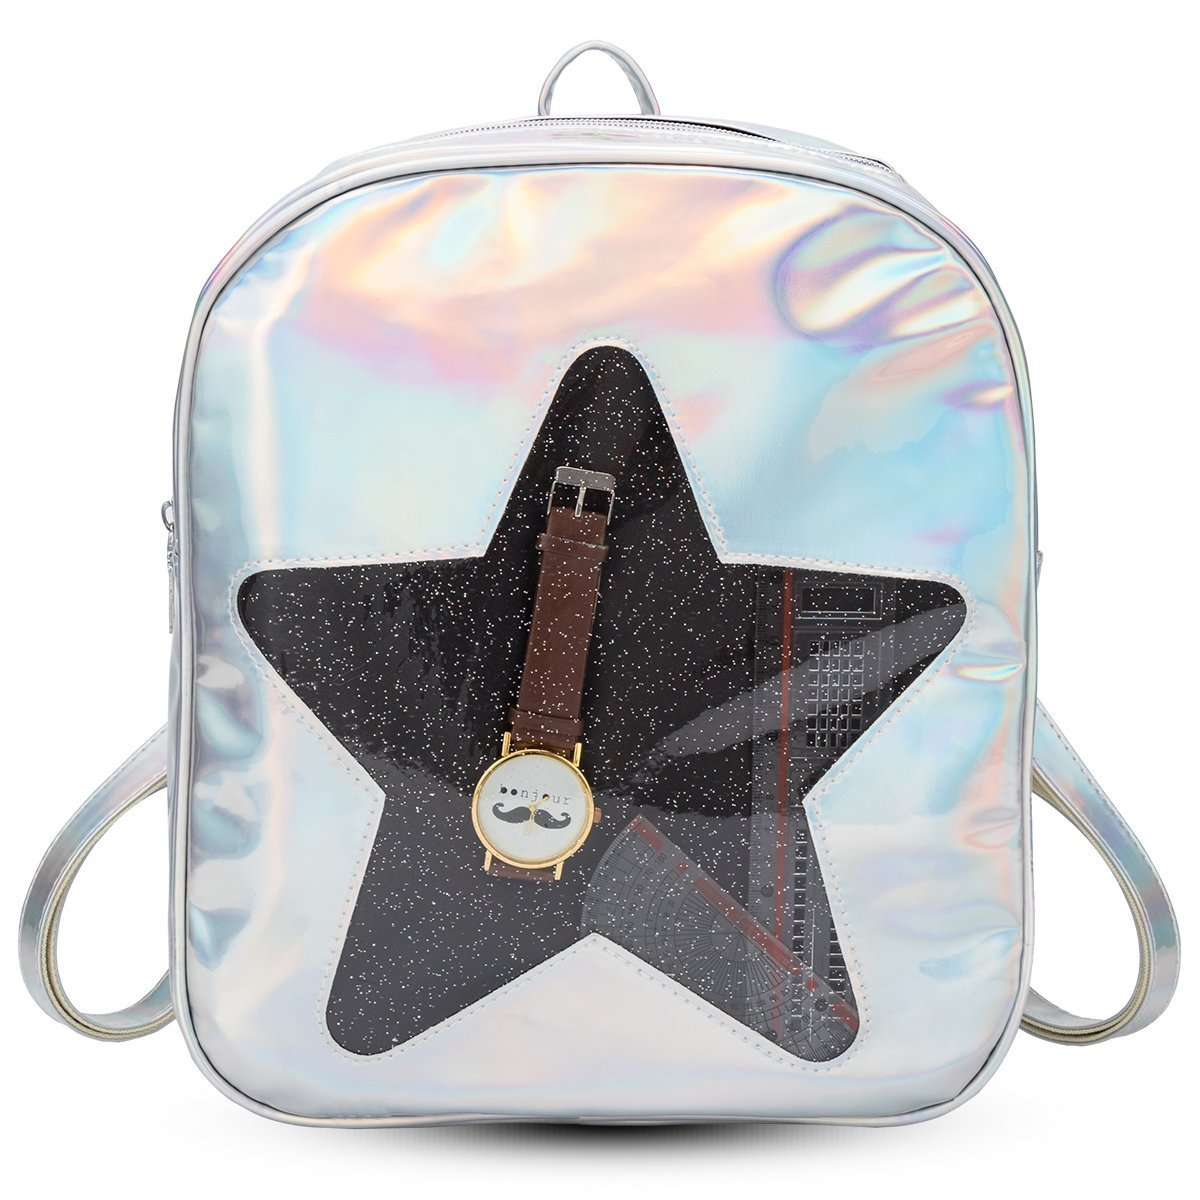 Girls Kawaii Bling Transparent Love Star School Bag Backpack (Star-Silver) by XSCOMSPORT (Image #1)